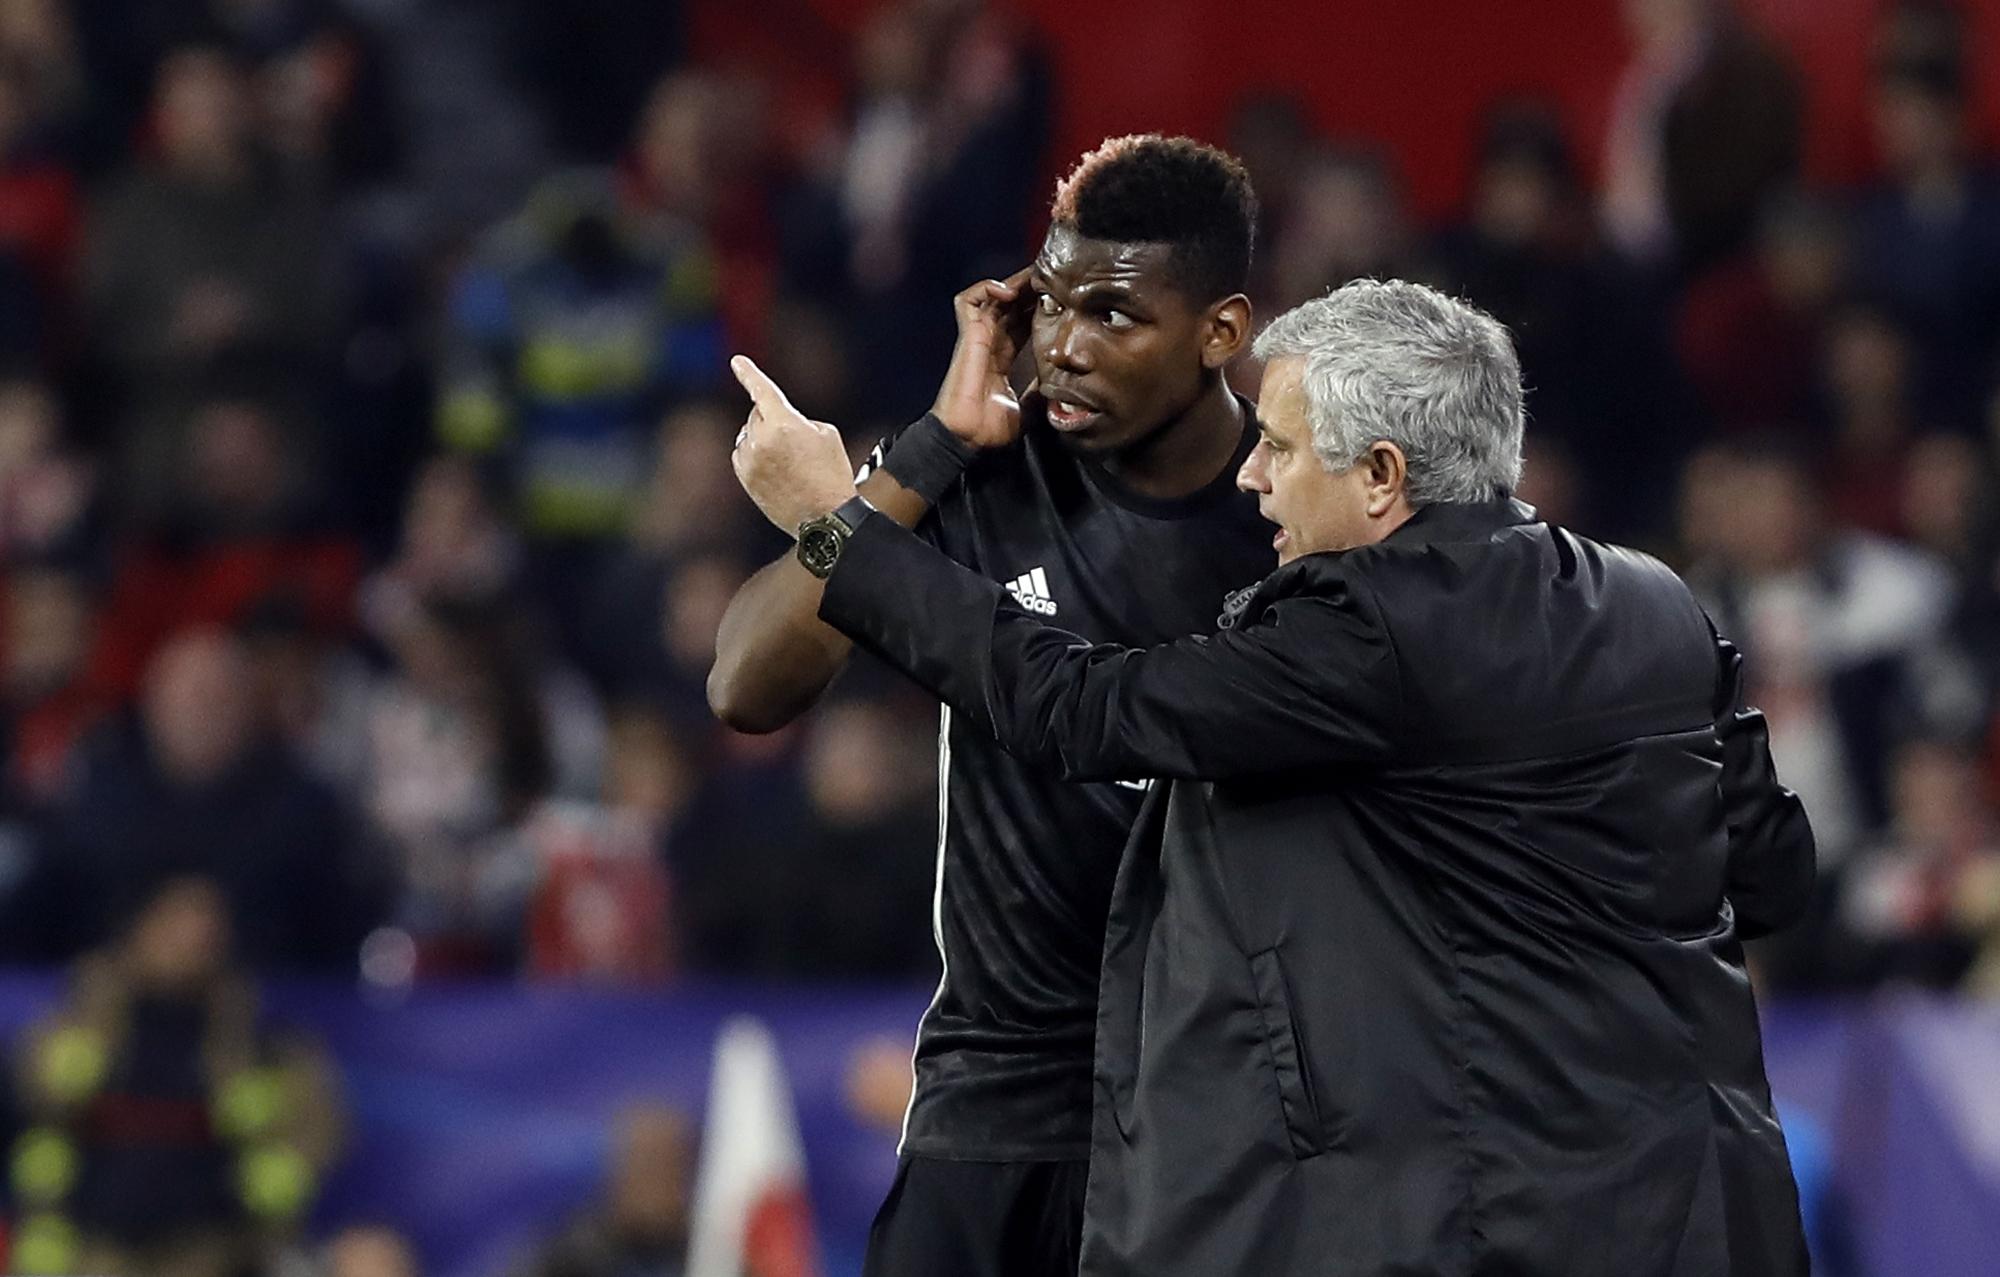 Jose Mourinho talks to  Paul Pogba during last night's Champions League match (AP Photo/Miguel Morenatti)